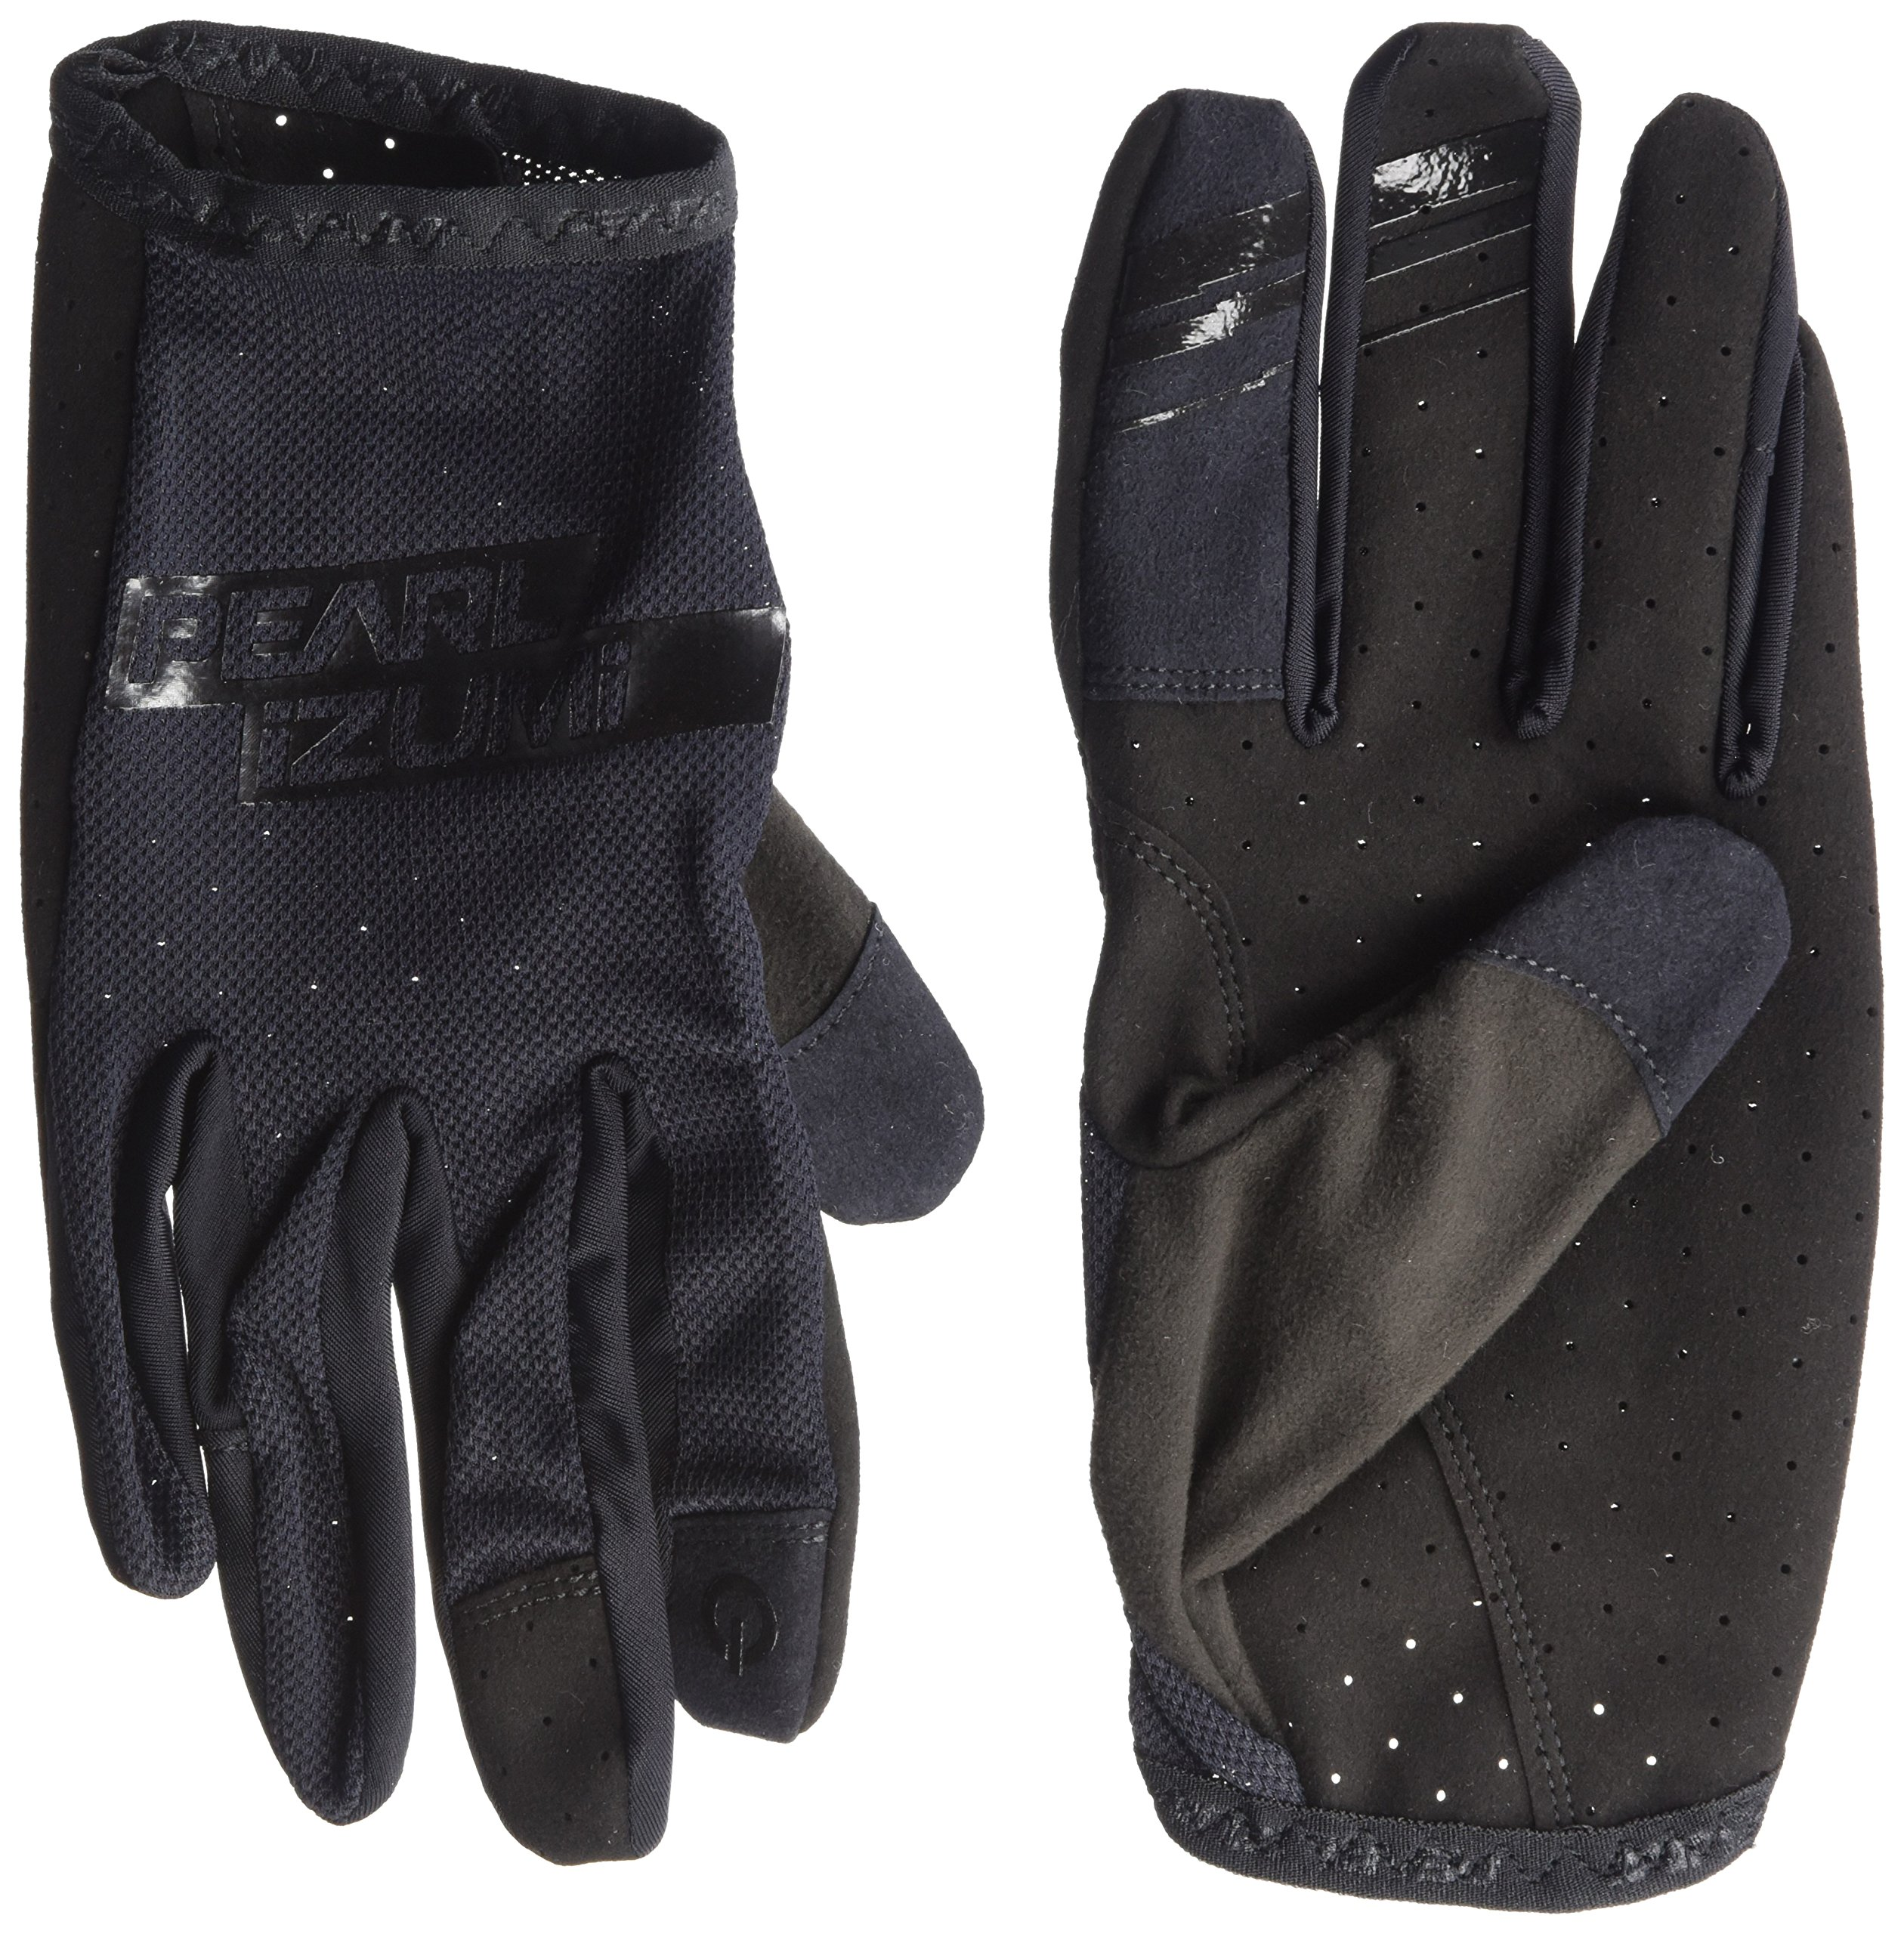 Pearl iZUMi Men's Divide Gloves, Black/Black, Large